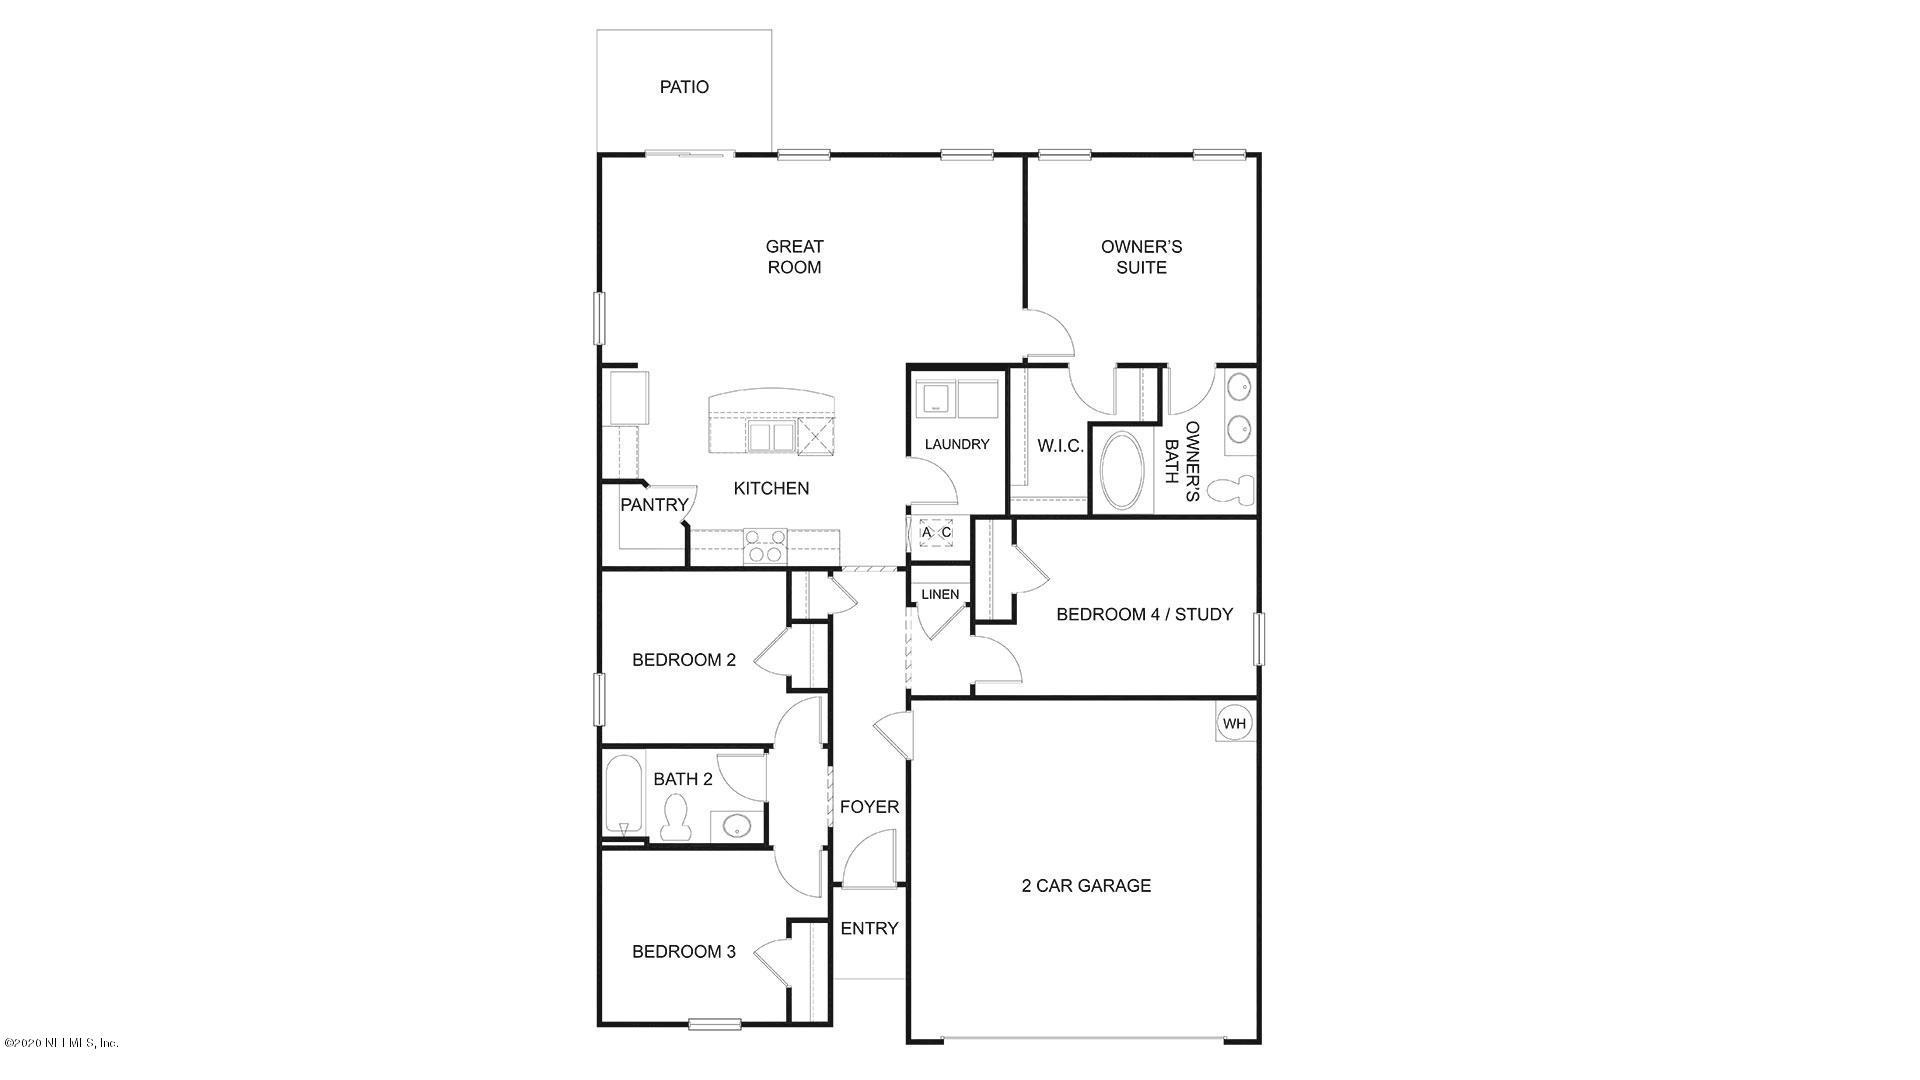 883 CAMERON OAKS, MIDDLEBURG, FLORIDA 32068, 4 Bedrooms Bedrooms, ,2 BathroomsBathrooms,Residential,For sale,CAMERON OAKS,1047555